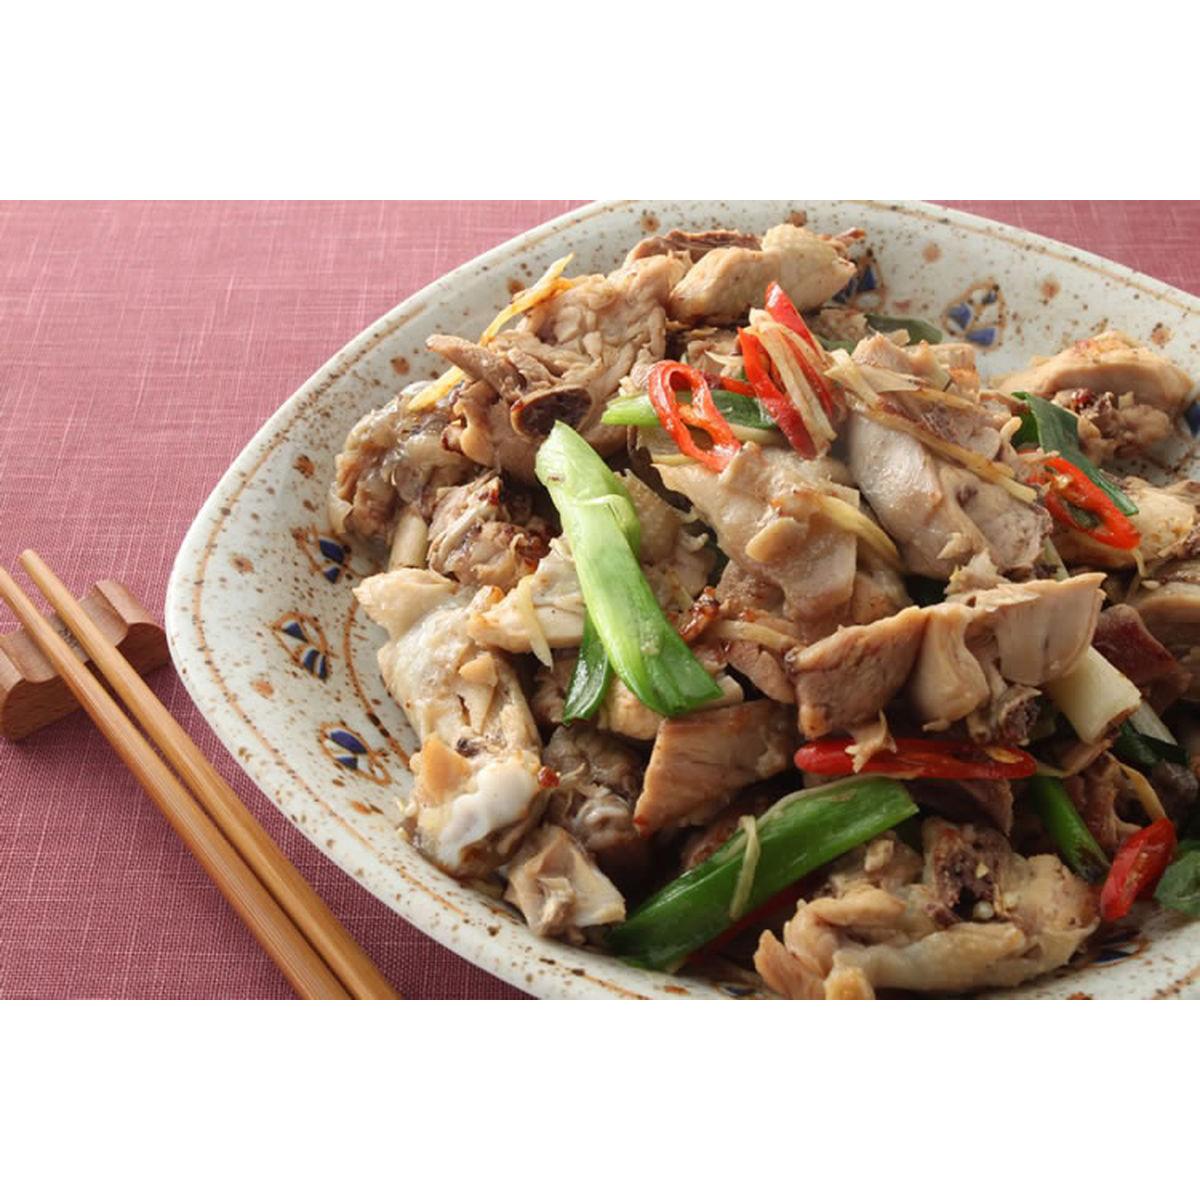 食譜:乾煸椒鹽雞